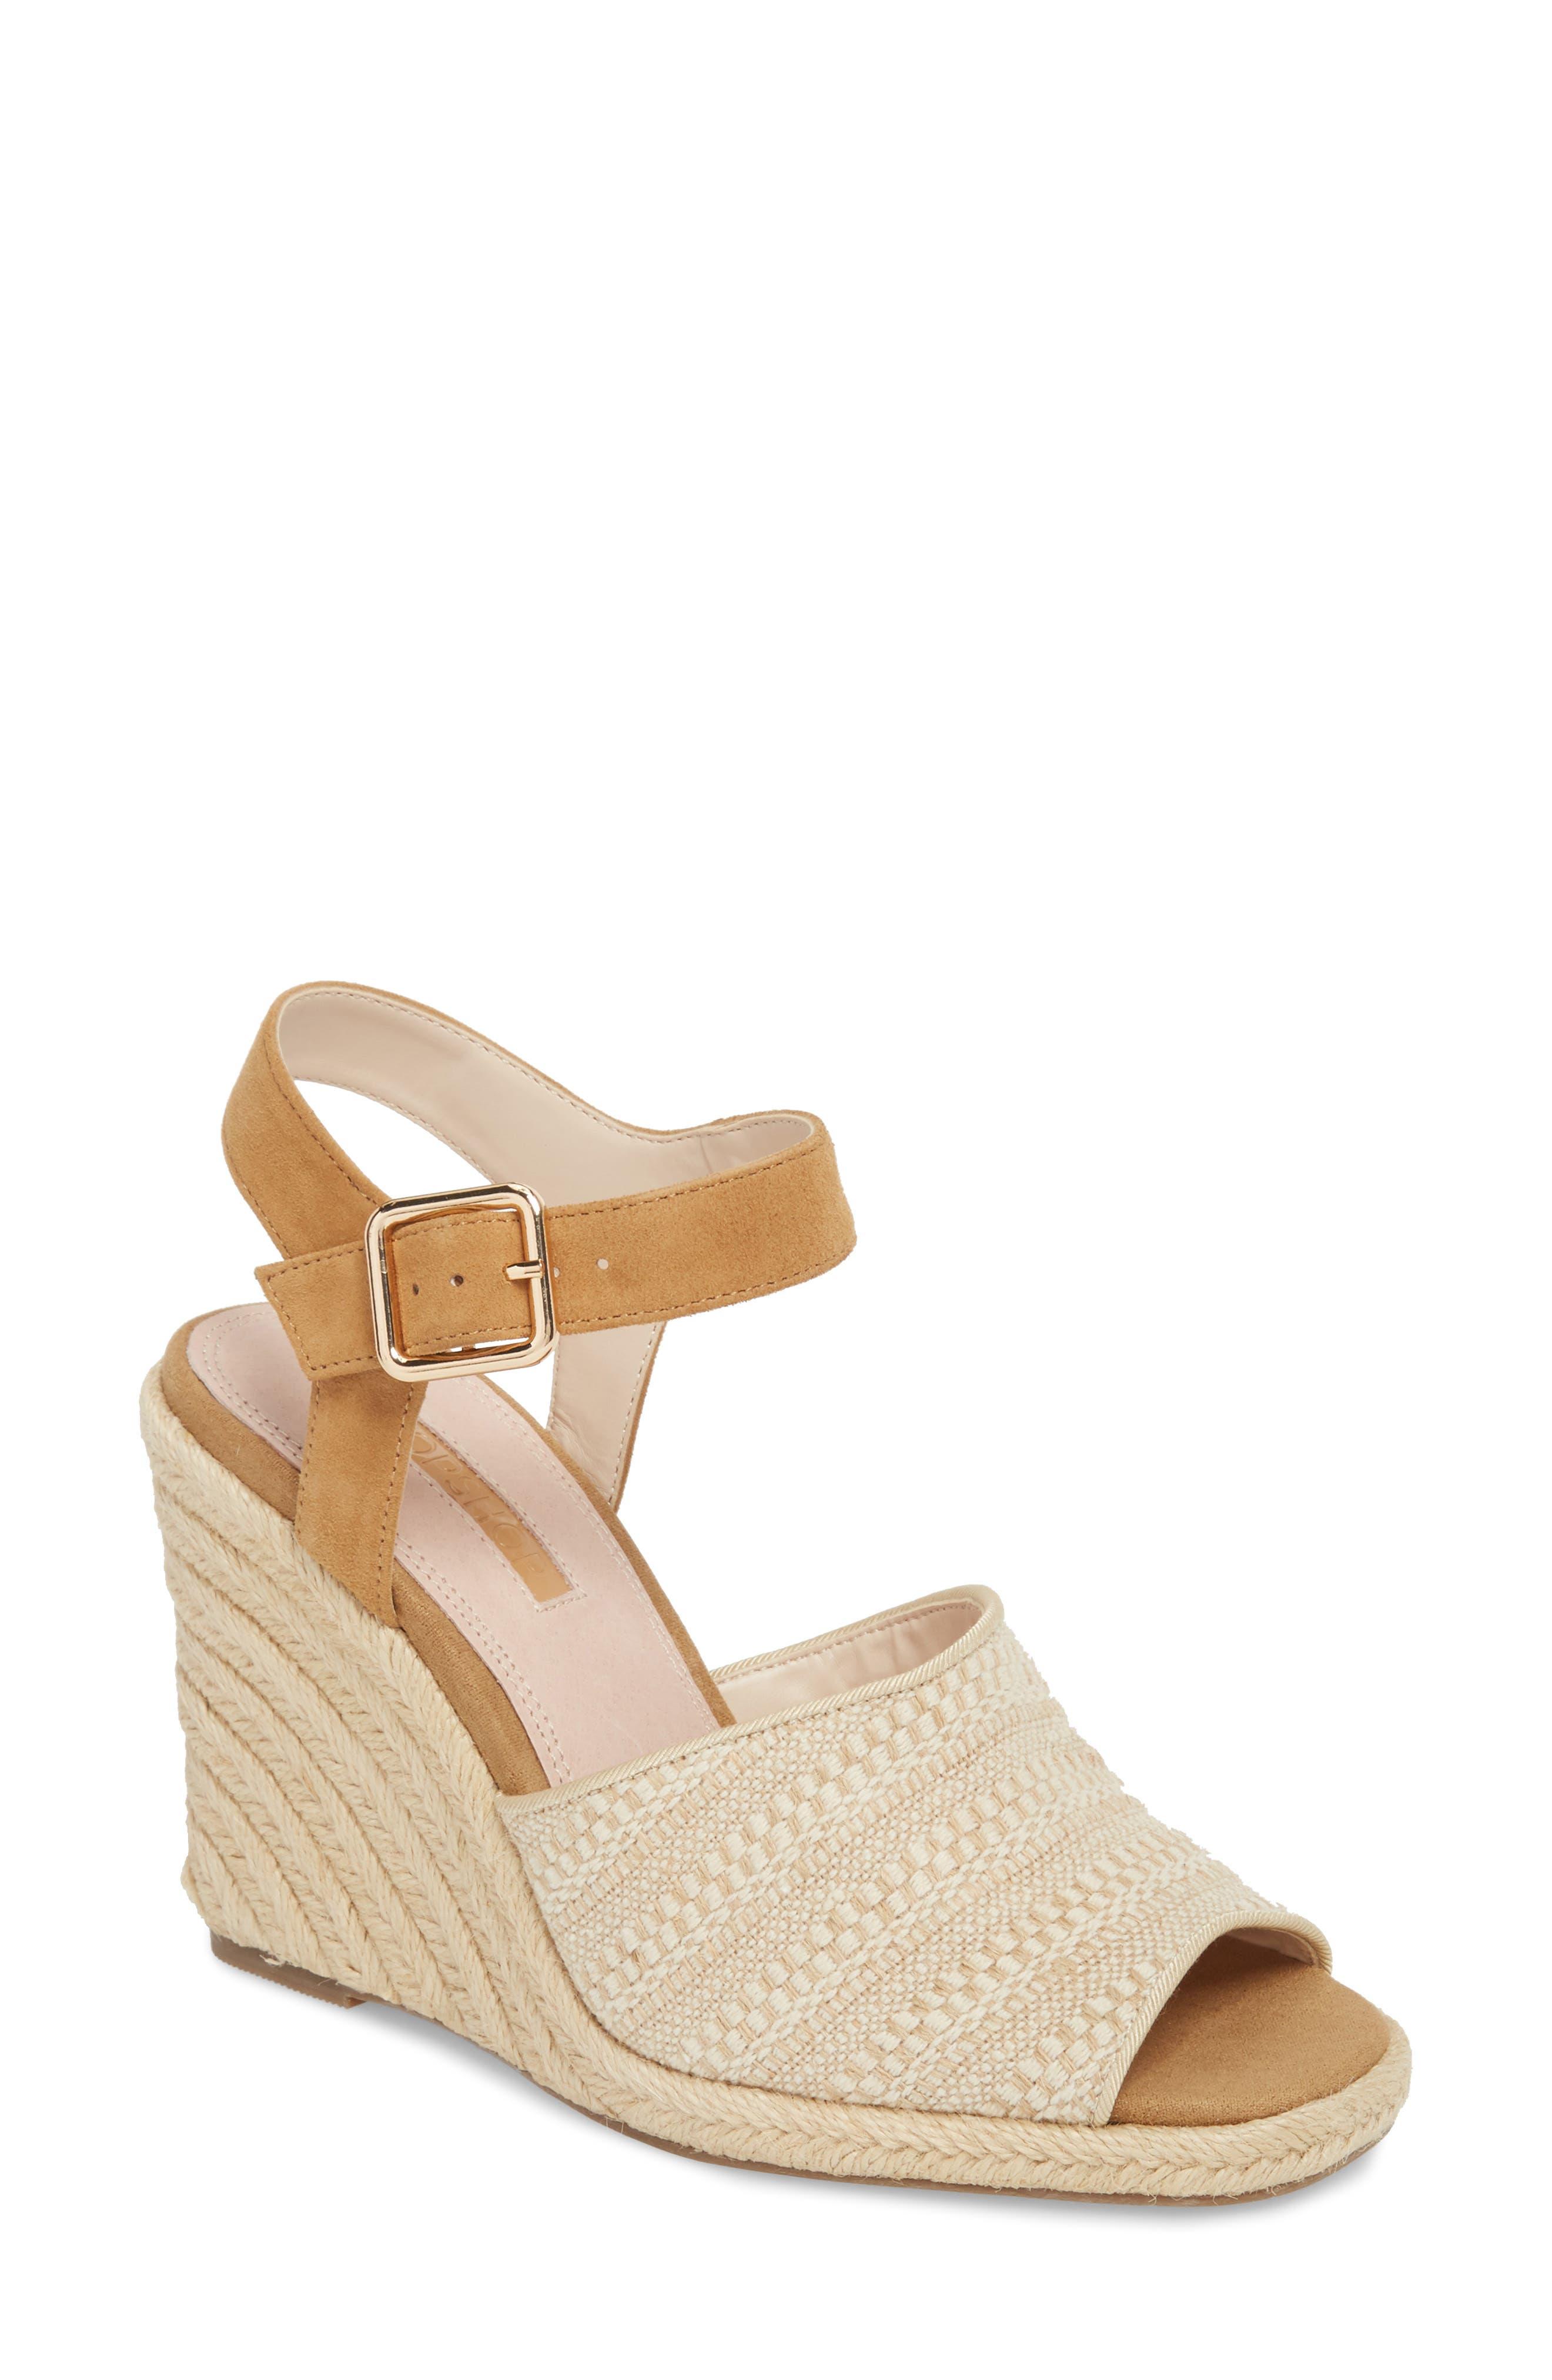 Winnie Espadrille Wedge Sandal,                         Main,                         color, 250